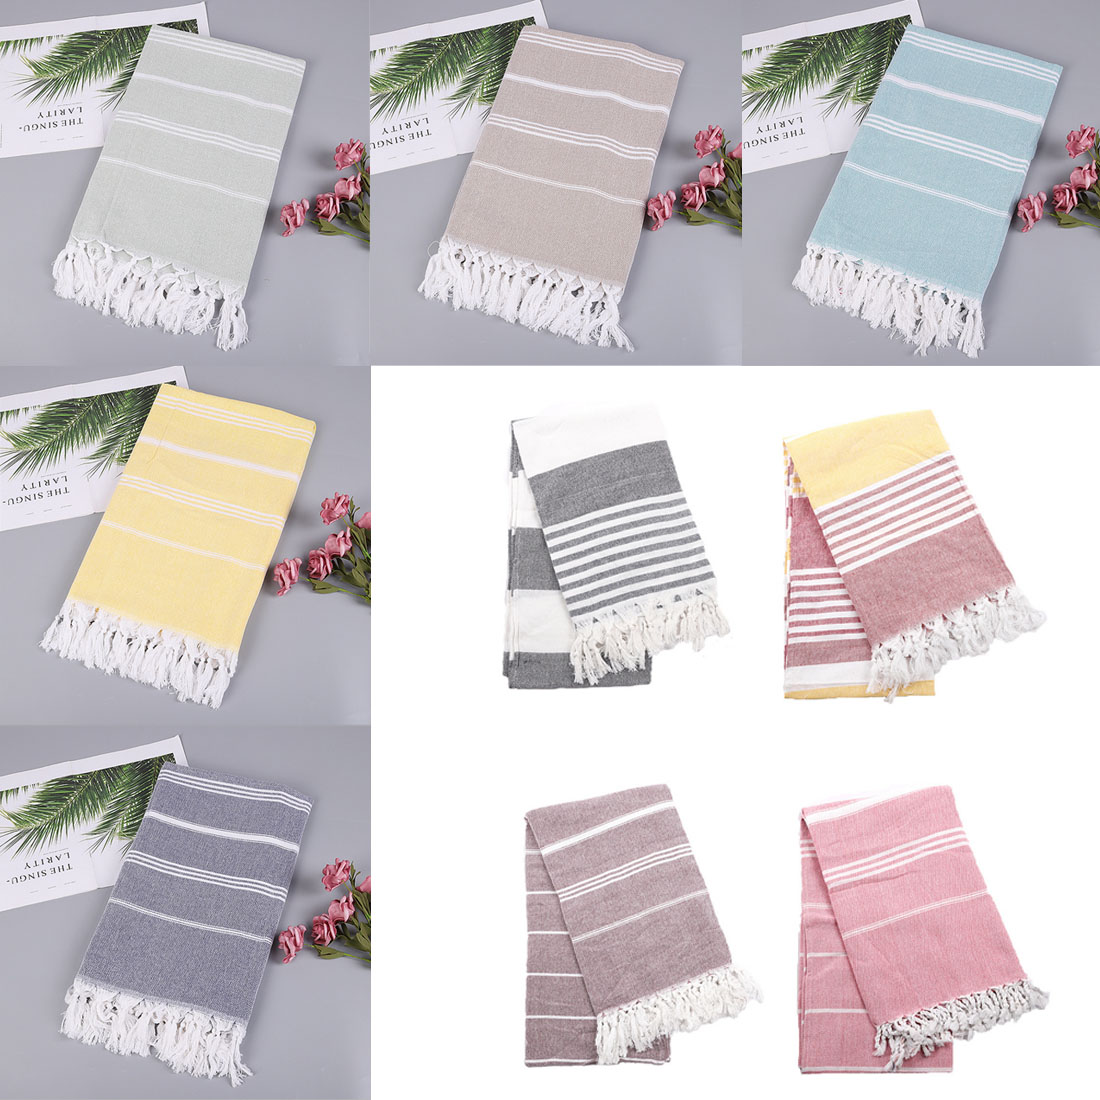 Turkish Beach Towels 24 Colors 100% Cotton Stripes Thin